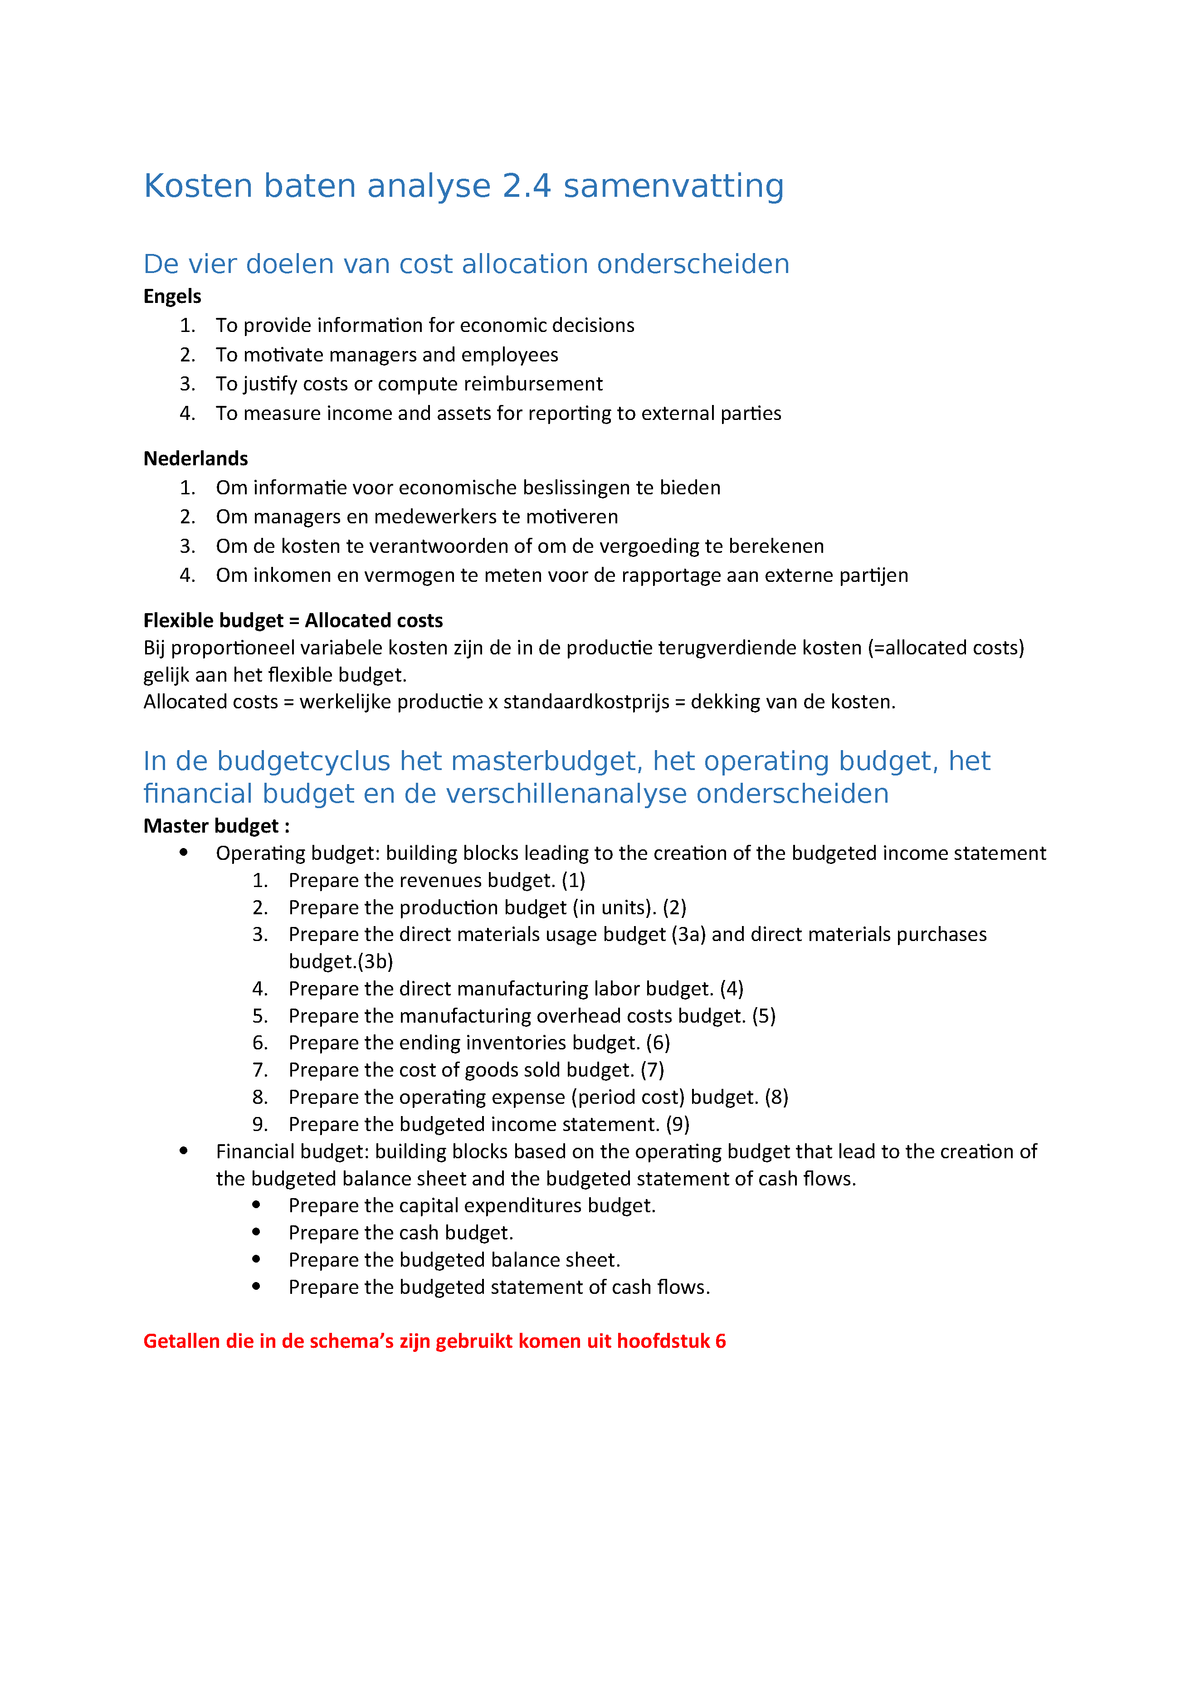 54504ccf04810e Kosten baten analyse 2.4 samenvatting - L.FEM.11398 - StudeerSnel.nl